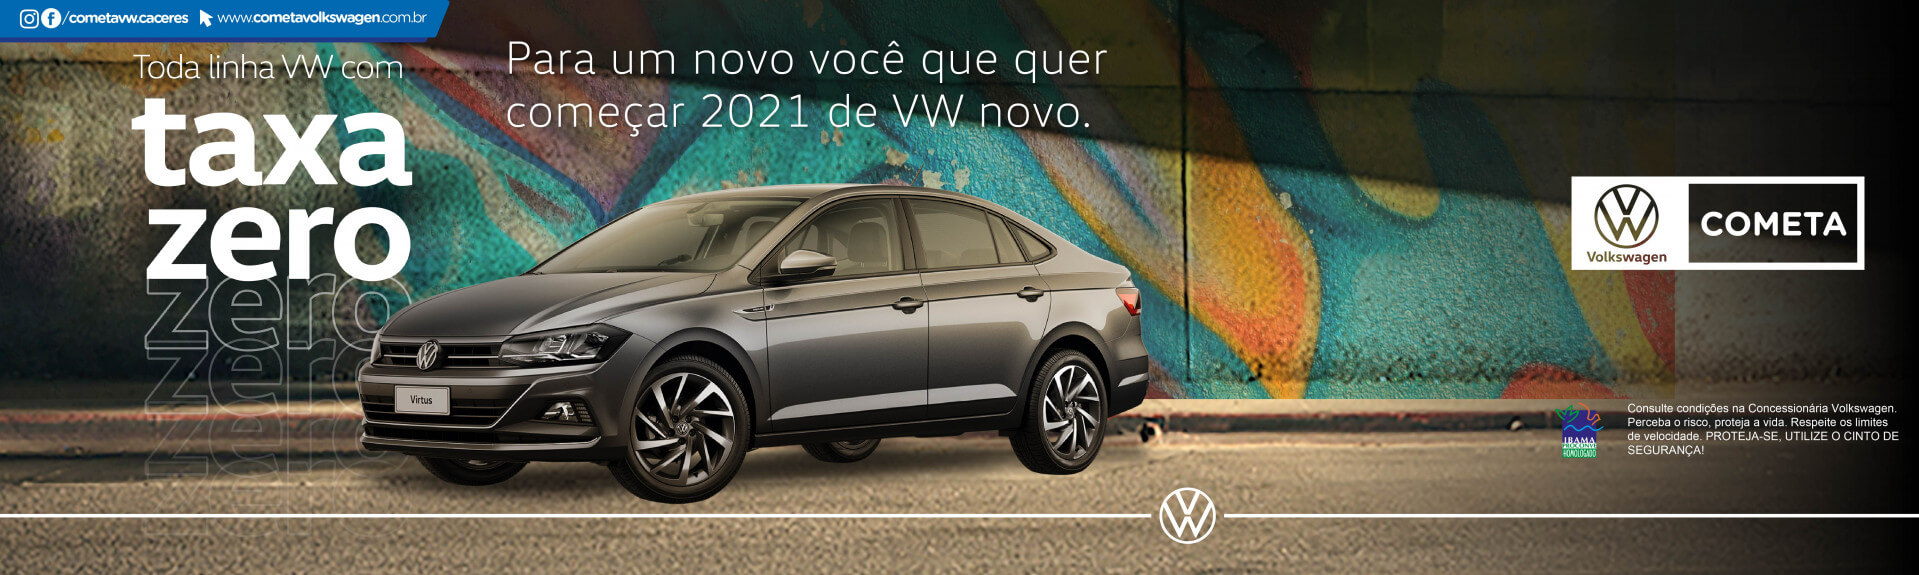 Linha VW taxa zero